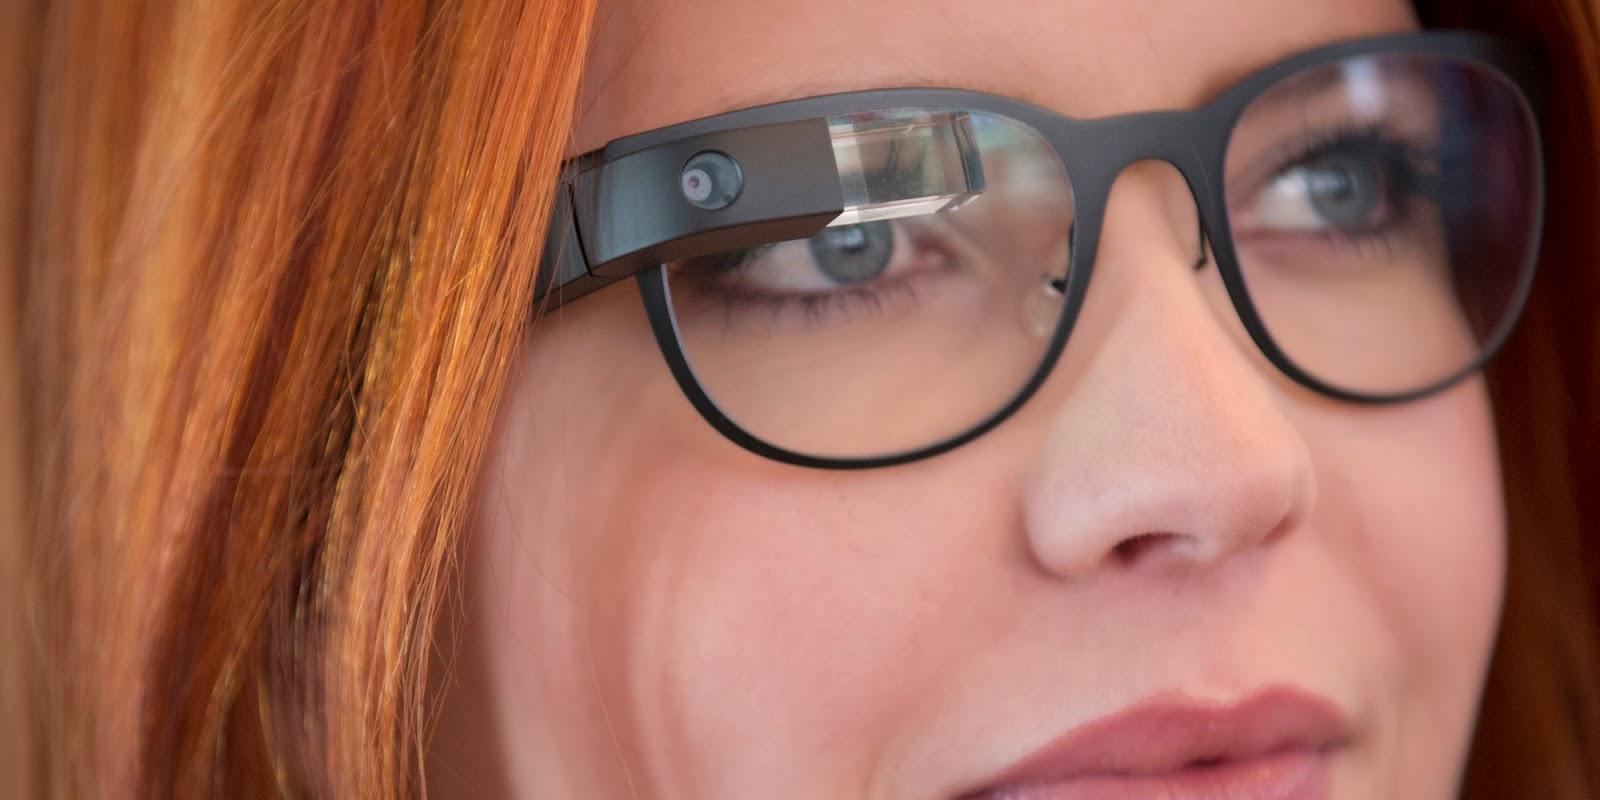 e248da640 لا شك أن الكثير من متابعي جديد العالم الرقمي أصبحوا متيقنين أن مشروع جوجل  المتعلق بنظاراتها الذكية Google Glass لن يجد طريقه إلى أرض الواقع، خصوصا  بعد ...